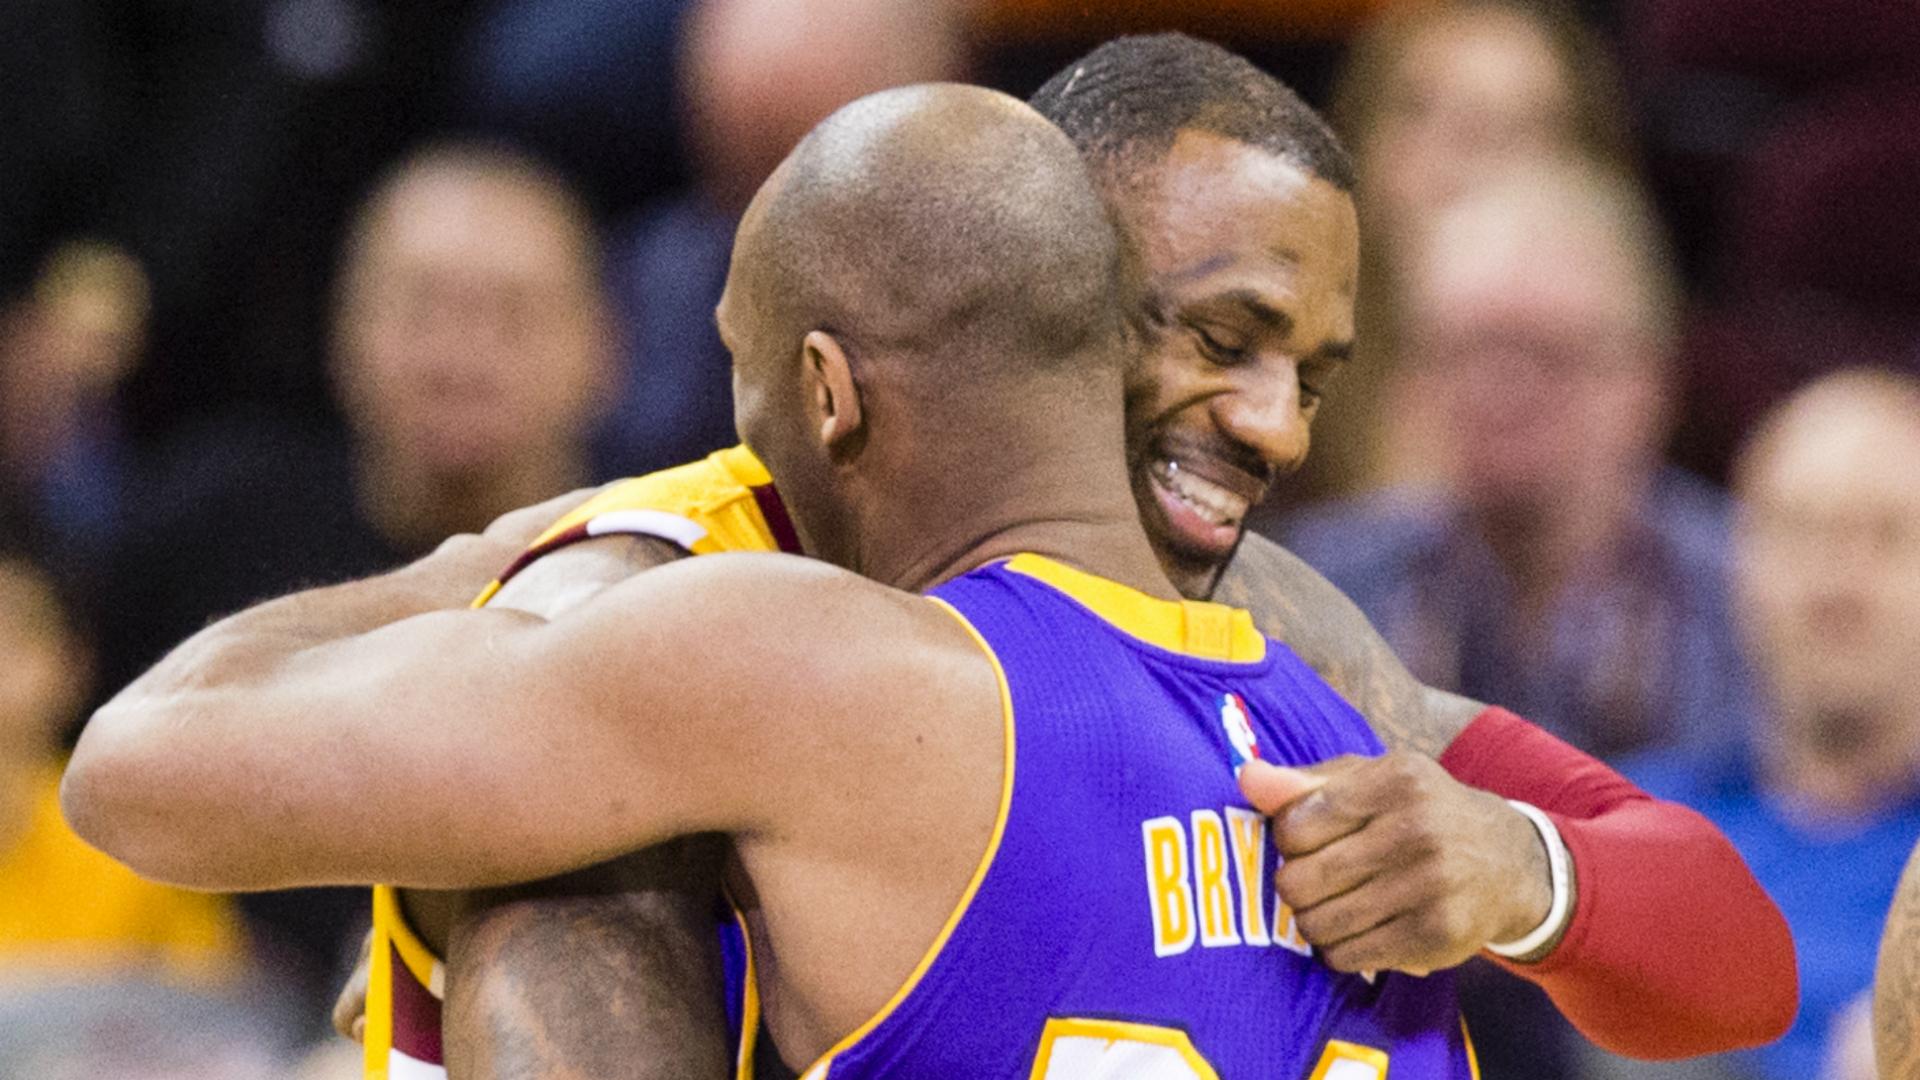 LeBron breaks silence on Kobe